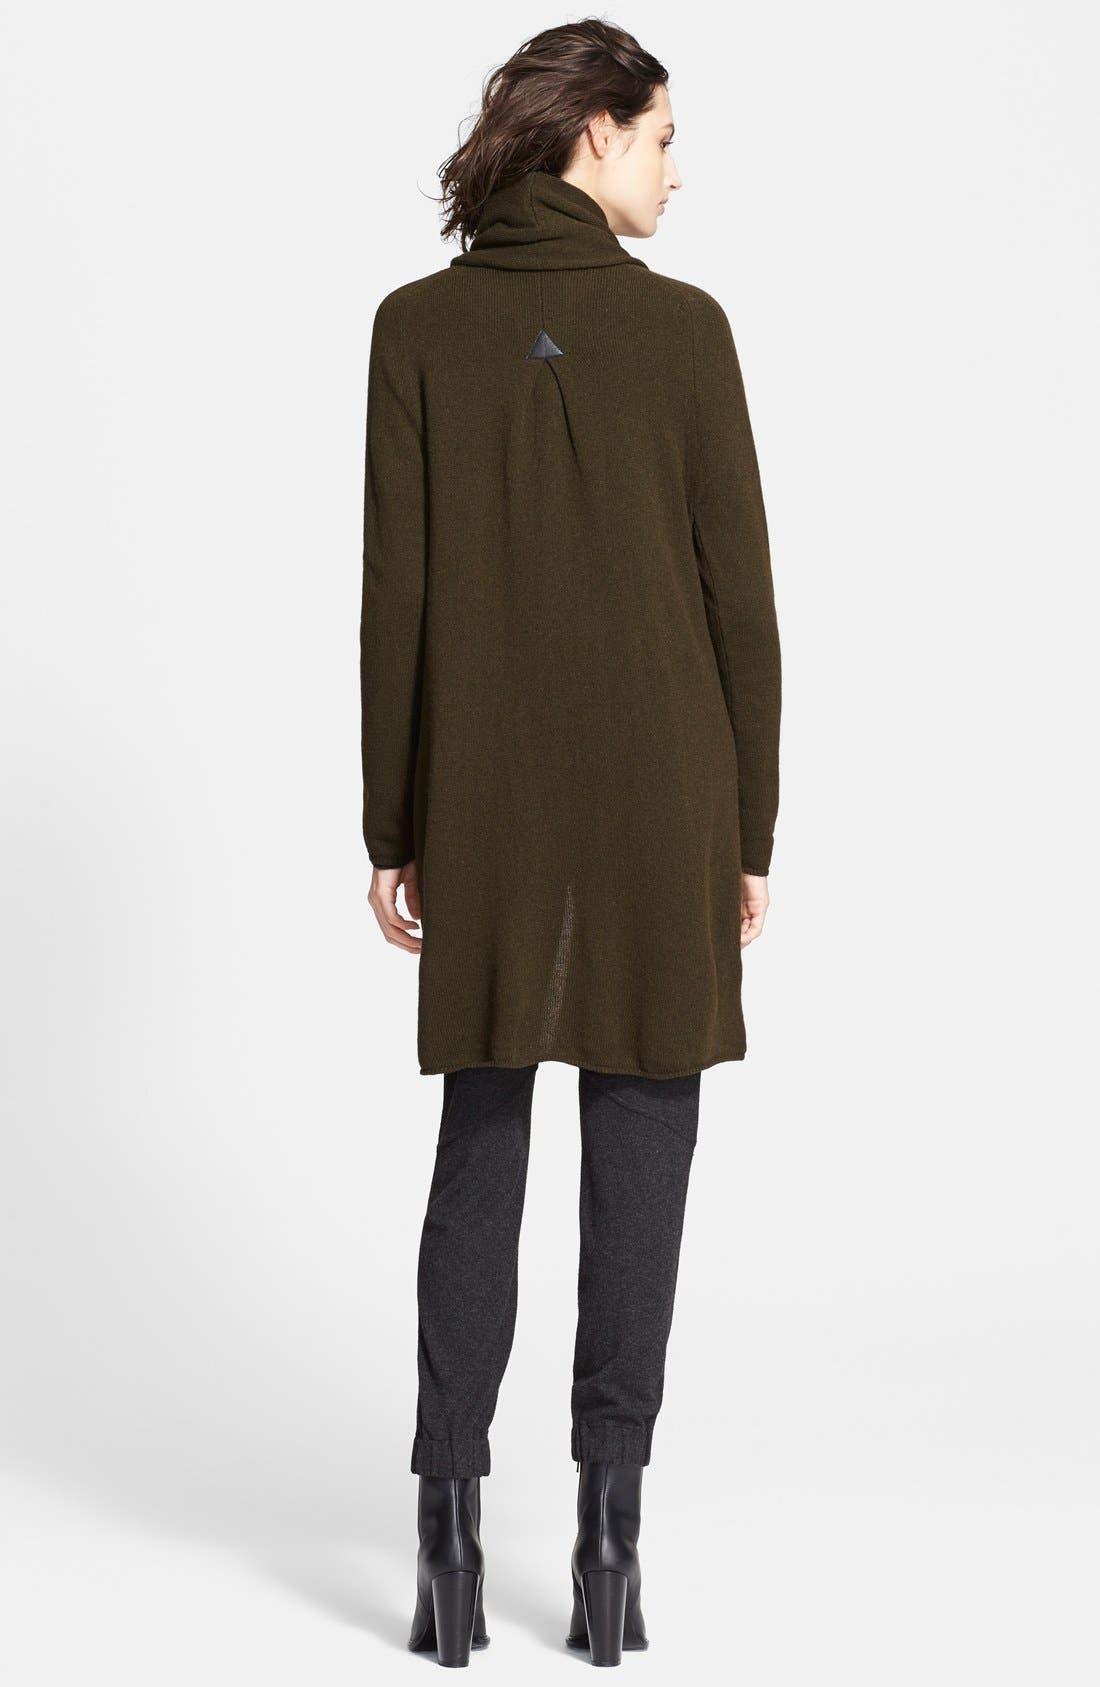 VINCE,                             Car Coat Sweater,                             Alternate thumbnail 6, color,                             303